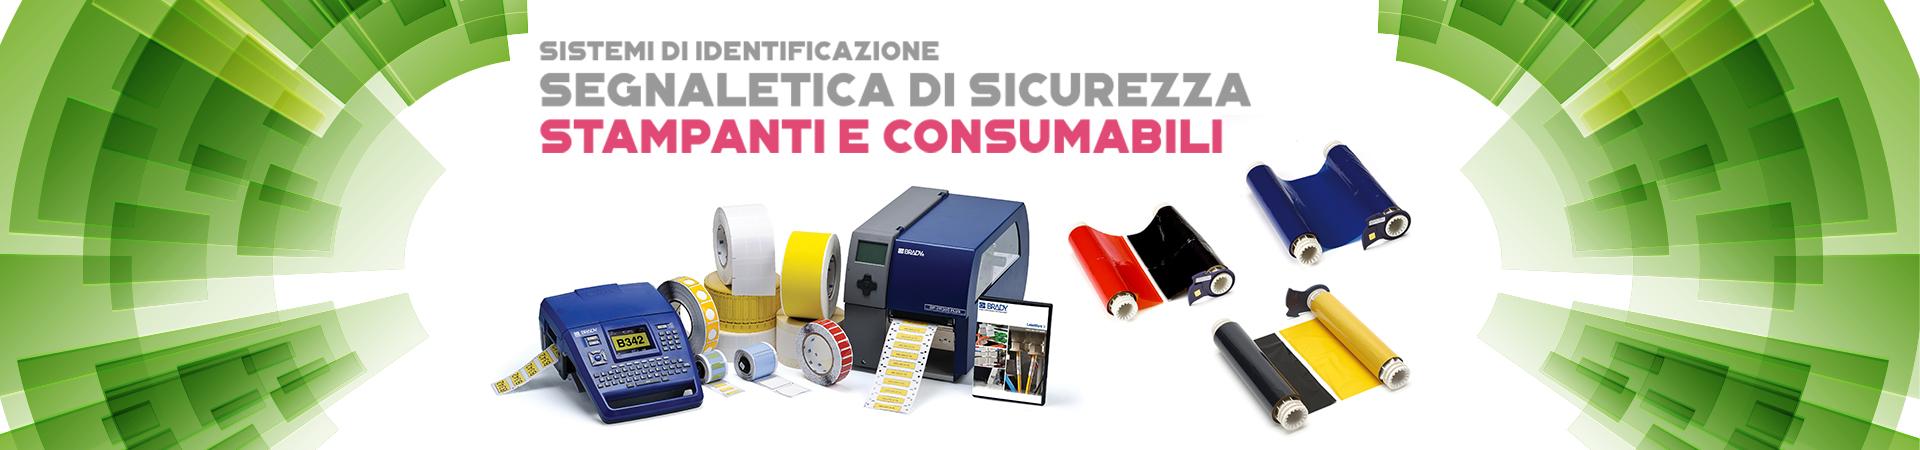 stampanti-consumabili